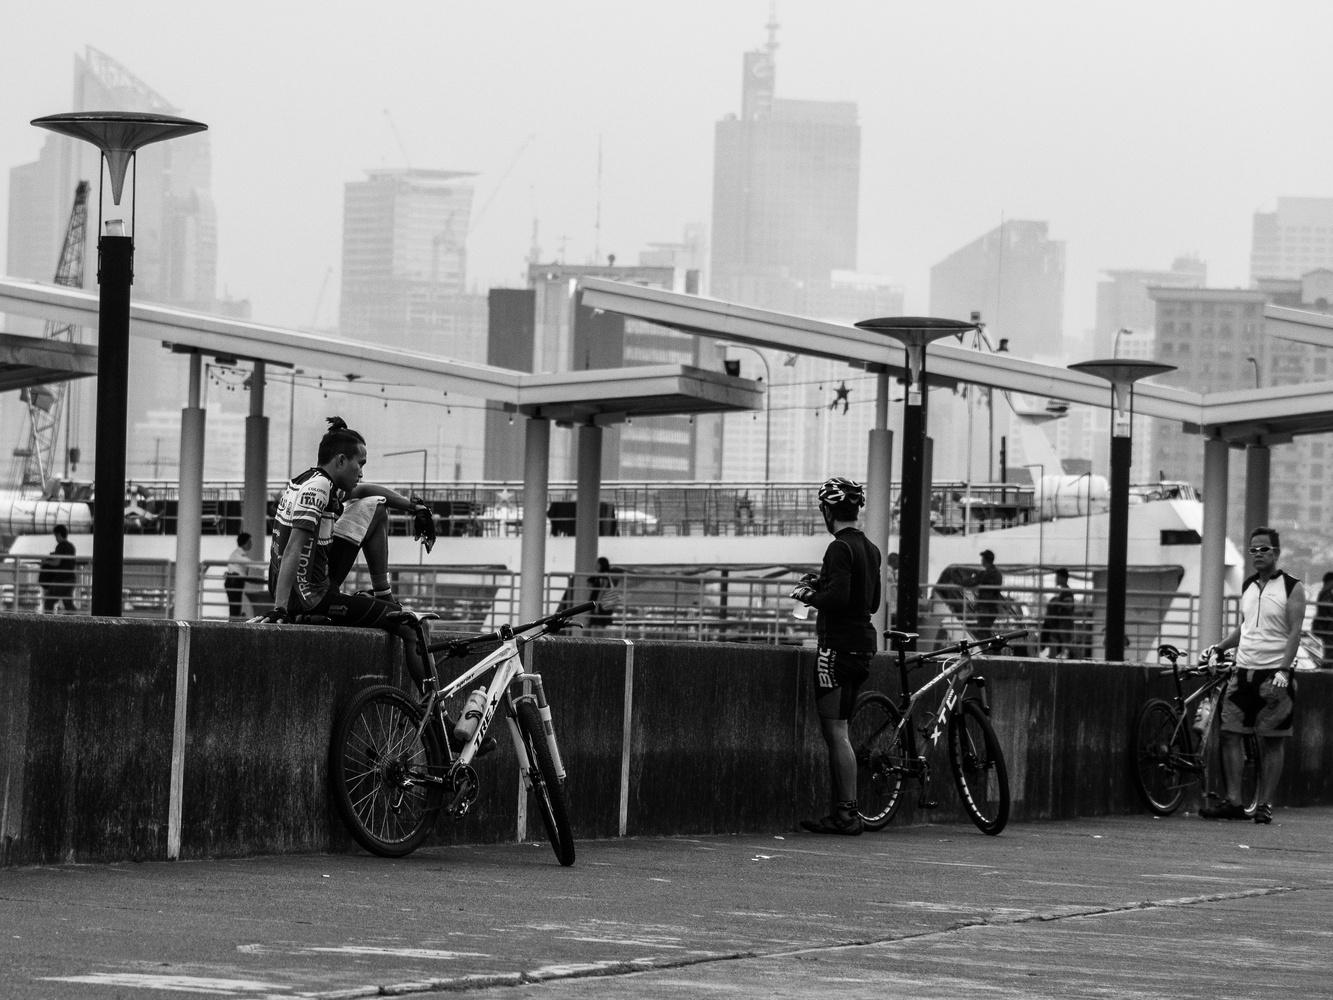 Three Cyclists by Matthew Roberge